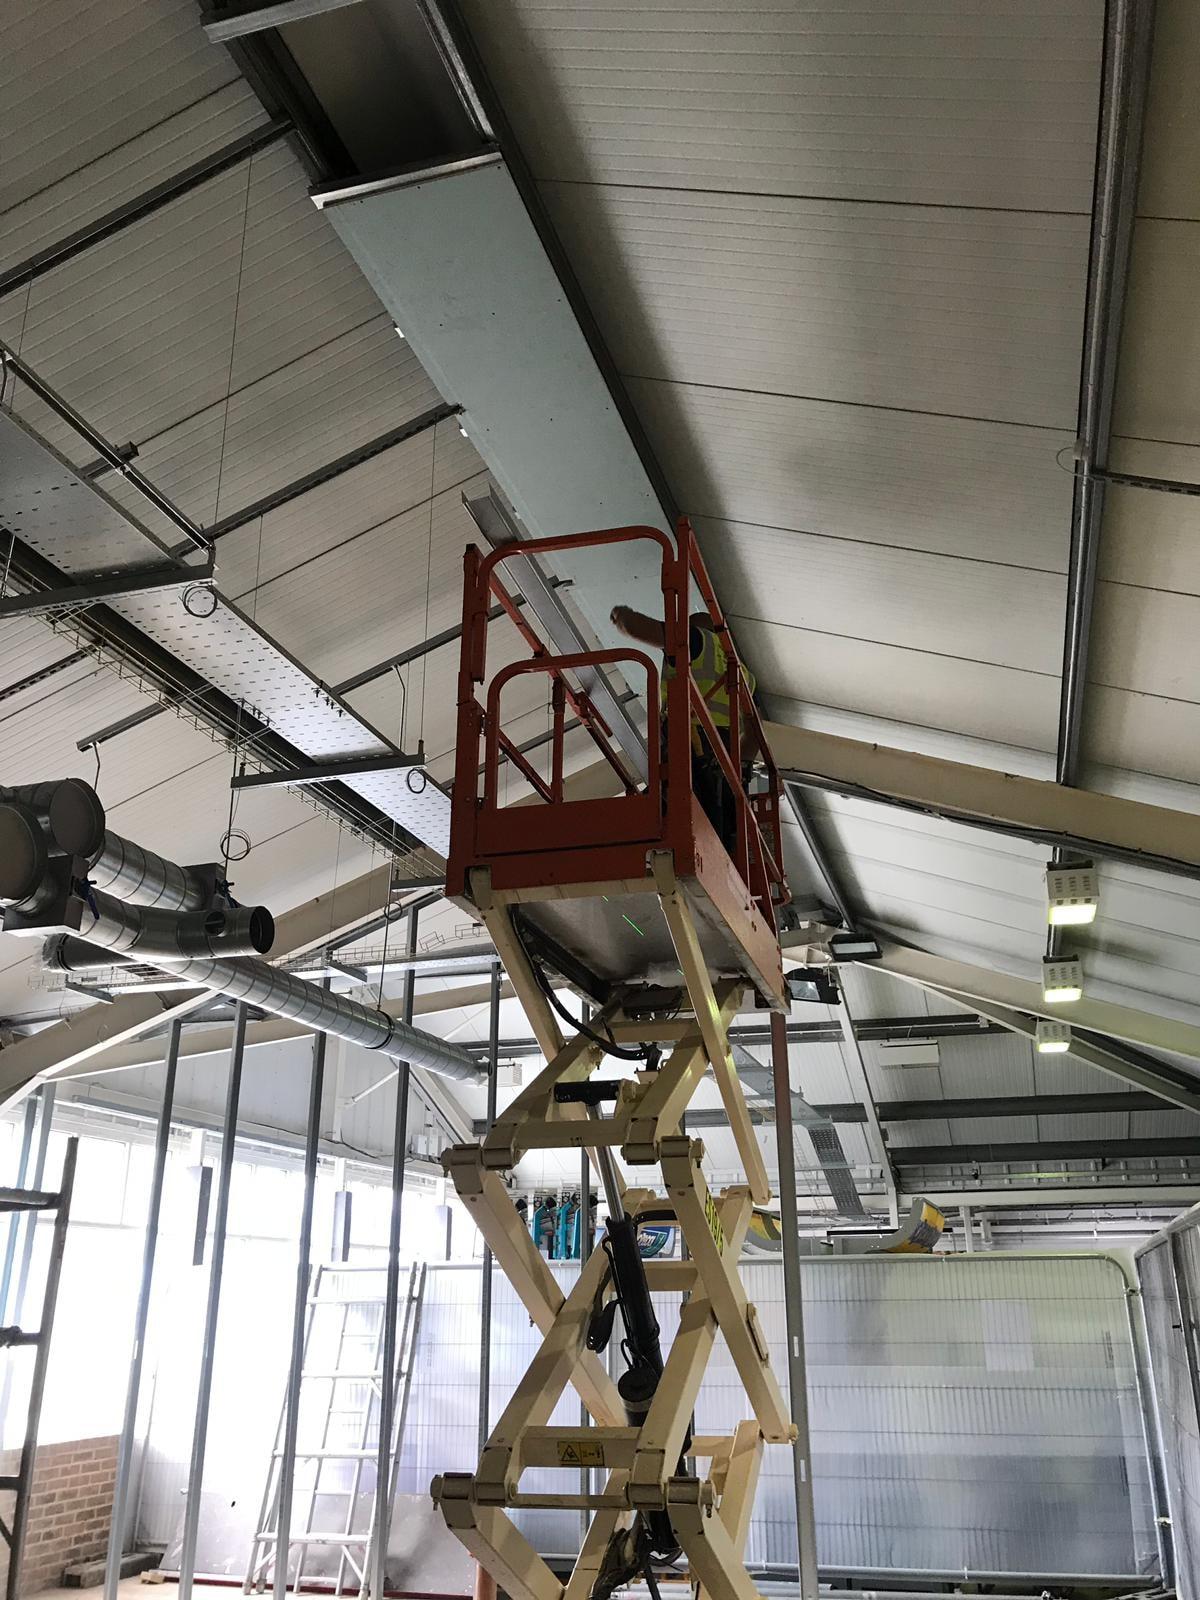 Engineer on Mechanical Lift